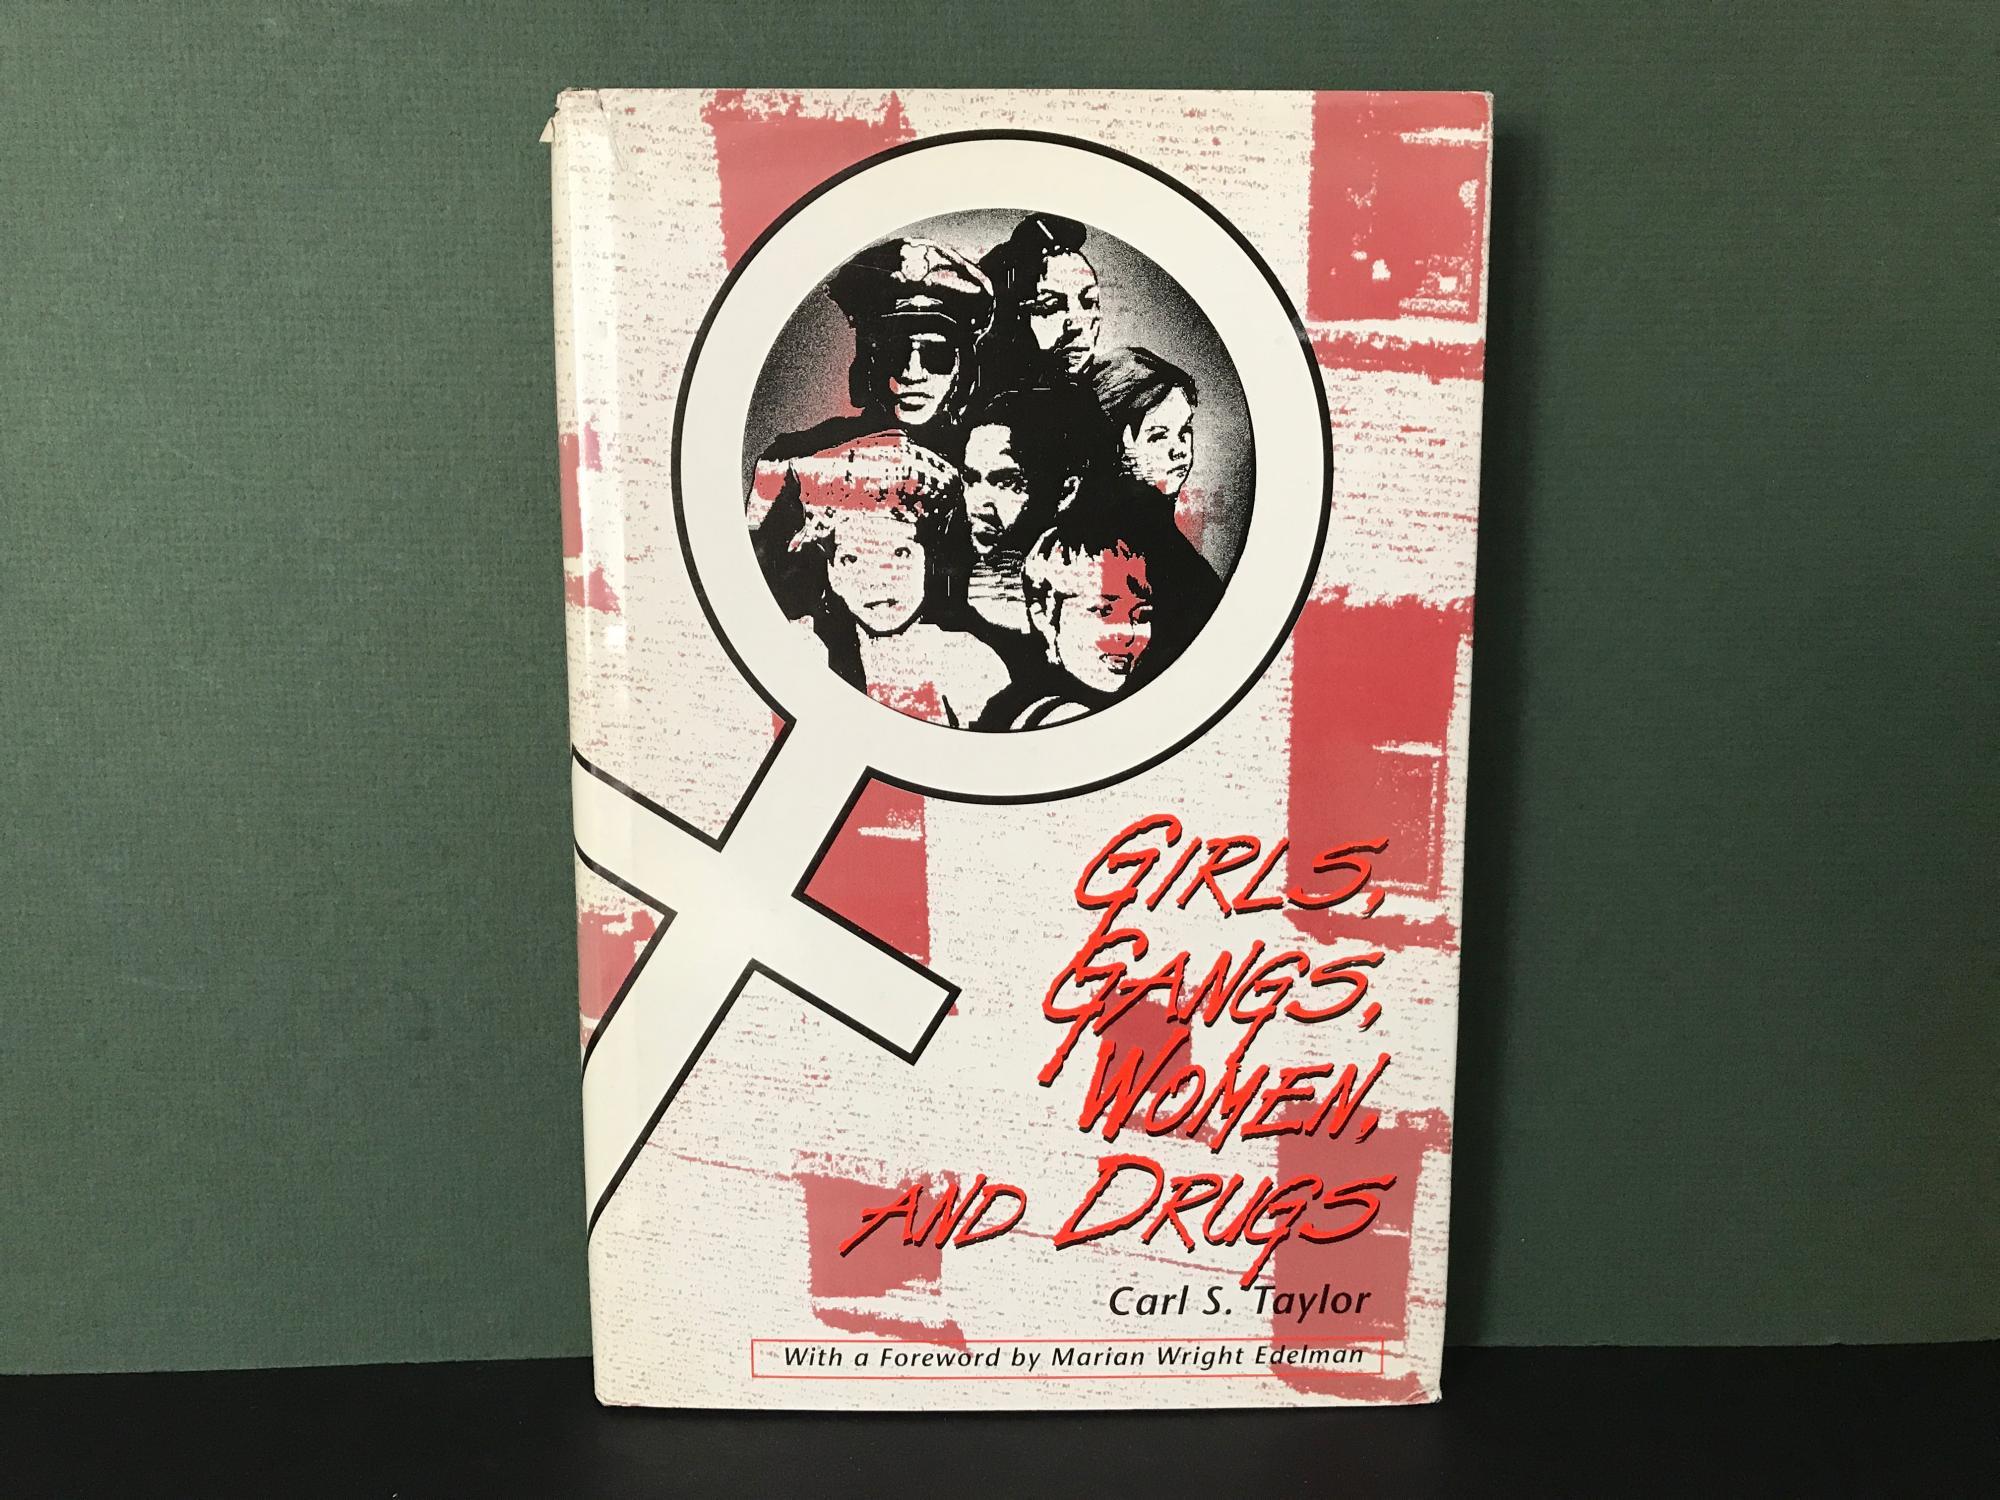 Gangs Women and Drugs Girls